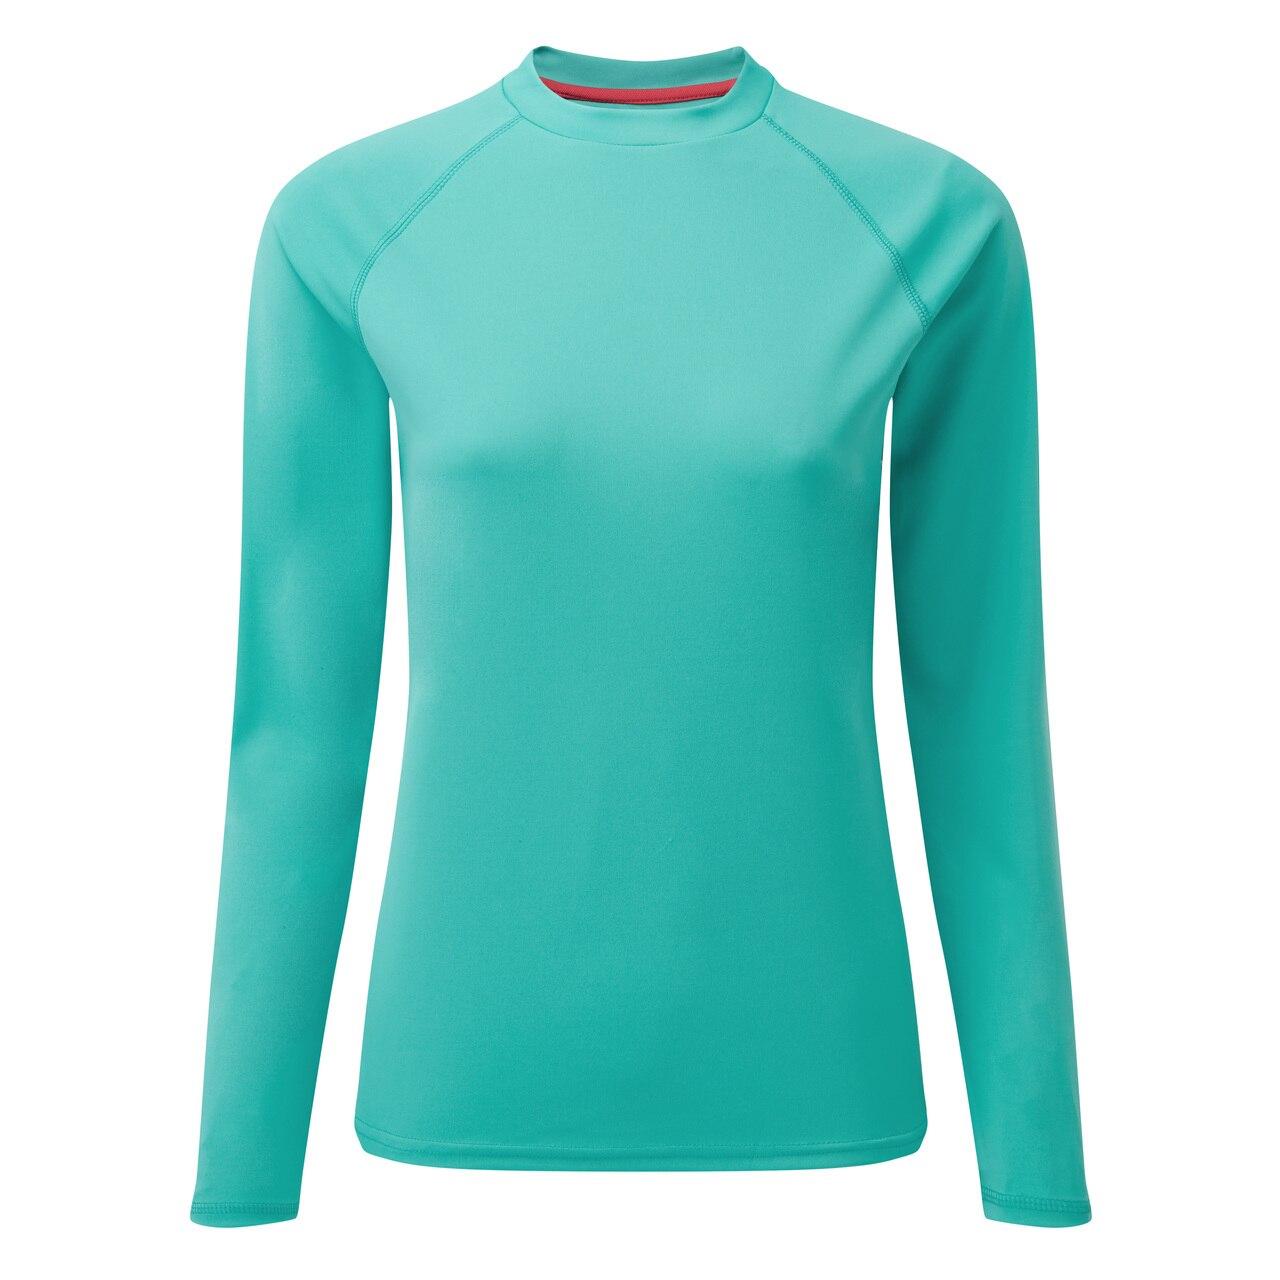 Women's UV Tec Long Sleeve Tee - UV011W-TUR02-1.jpg